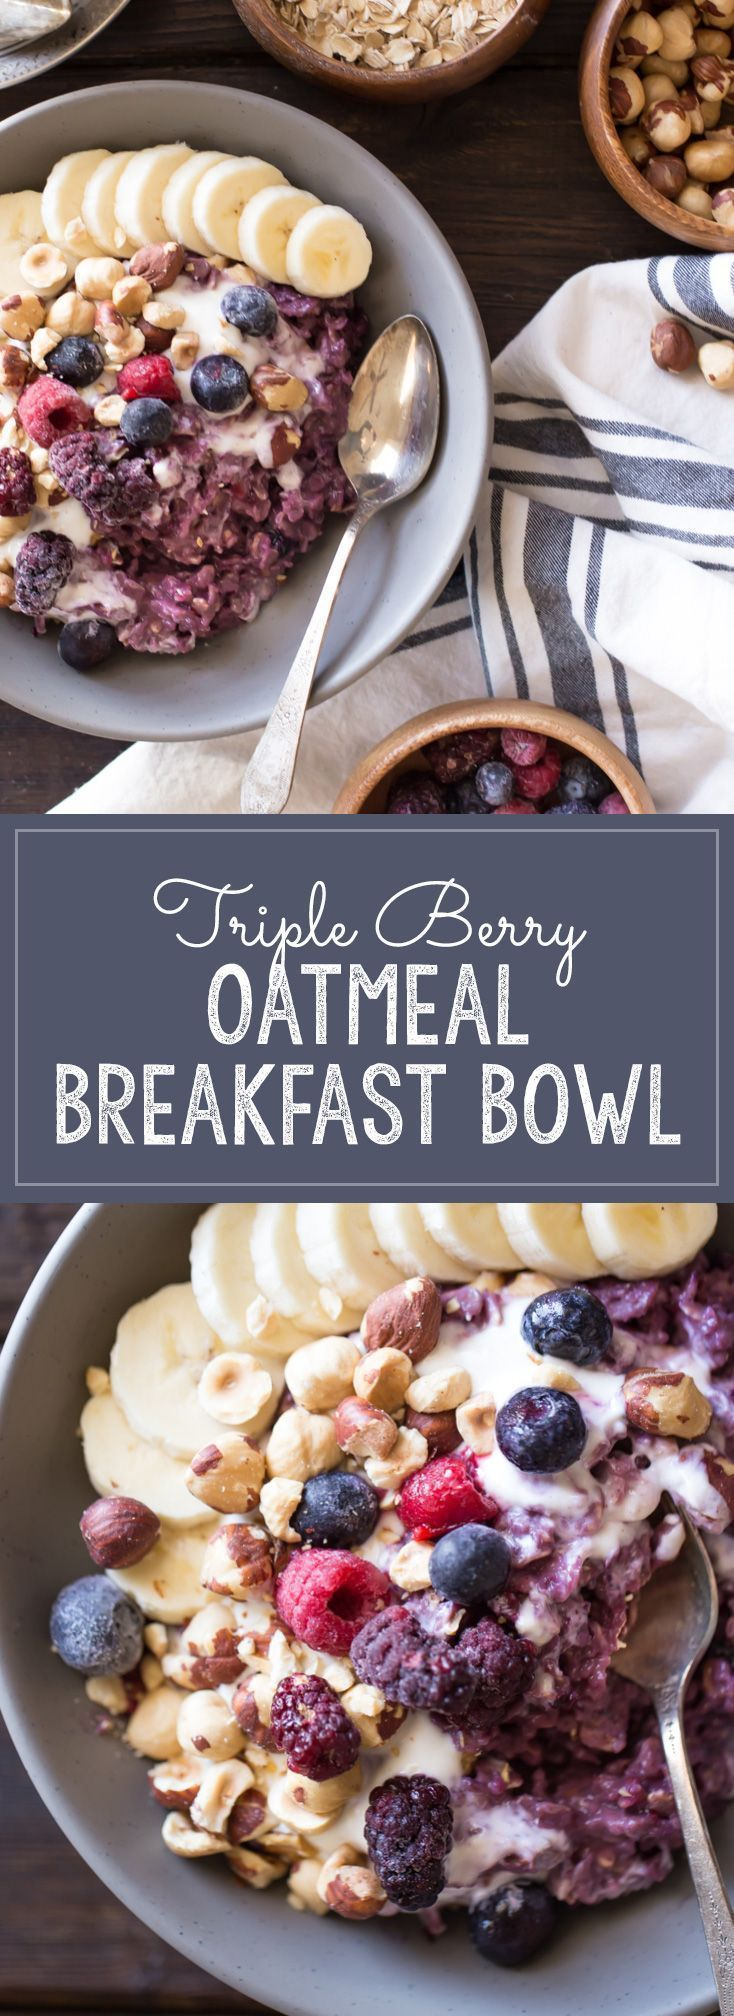 10 Oatmeal Breakfast Recipes You Never Knew Existed #vanillayogurt